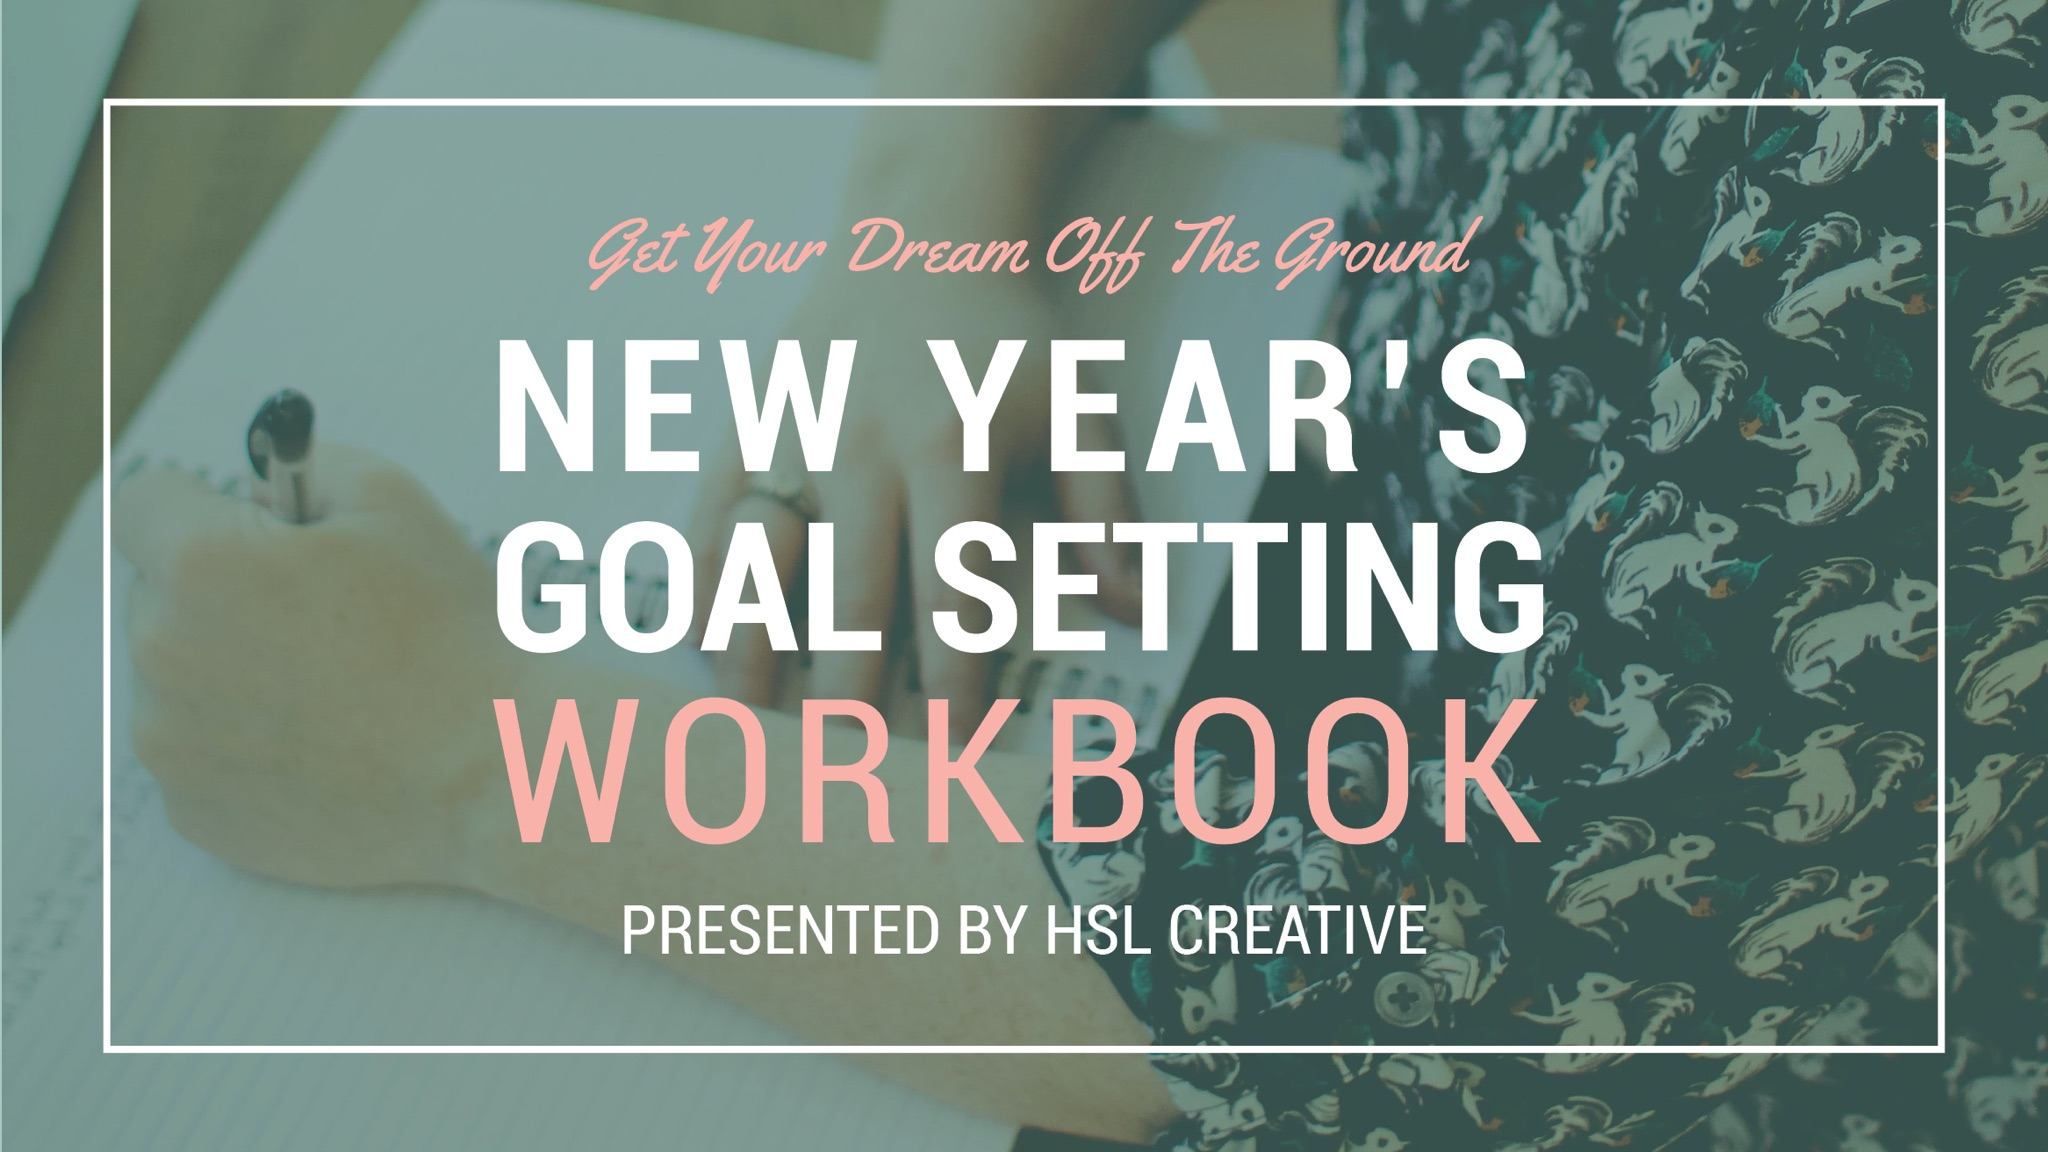 Dream Workbook Social Image Blog.jpg.jpeg